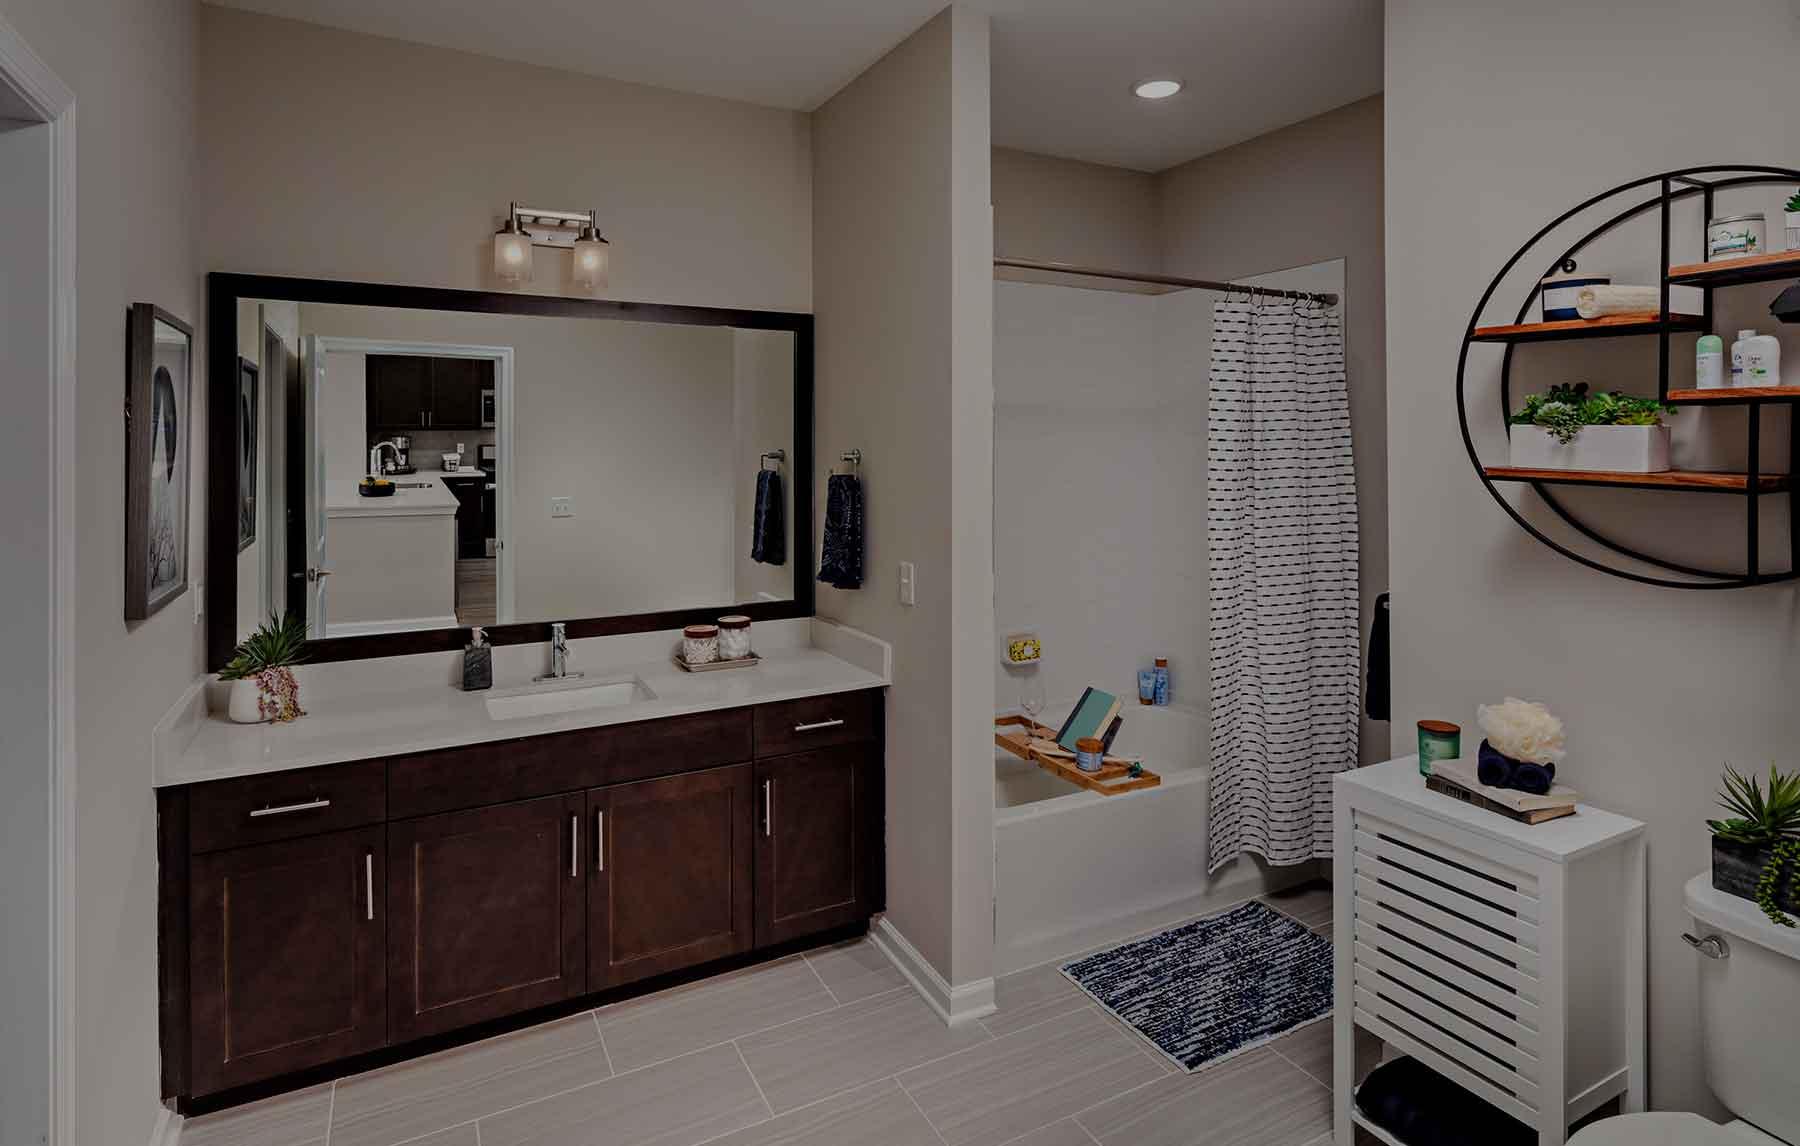 The Lofts at Monroe Parke bathroom interior